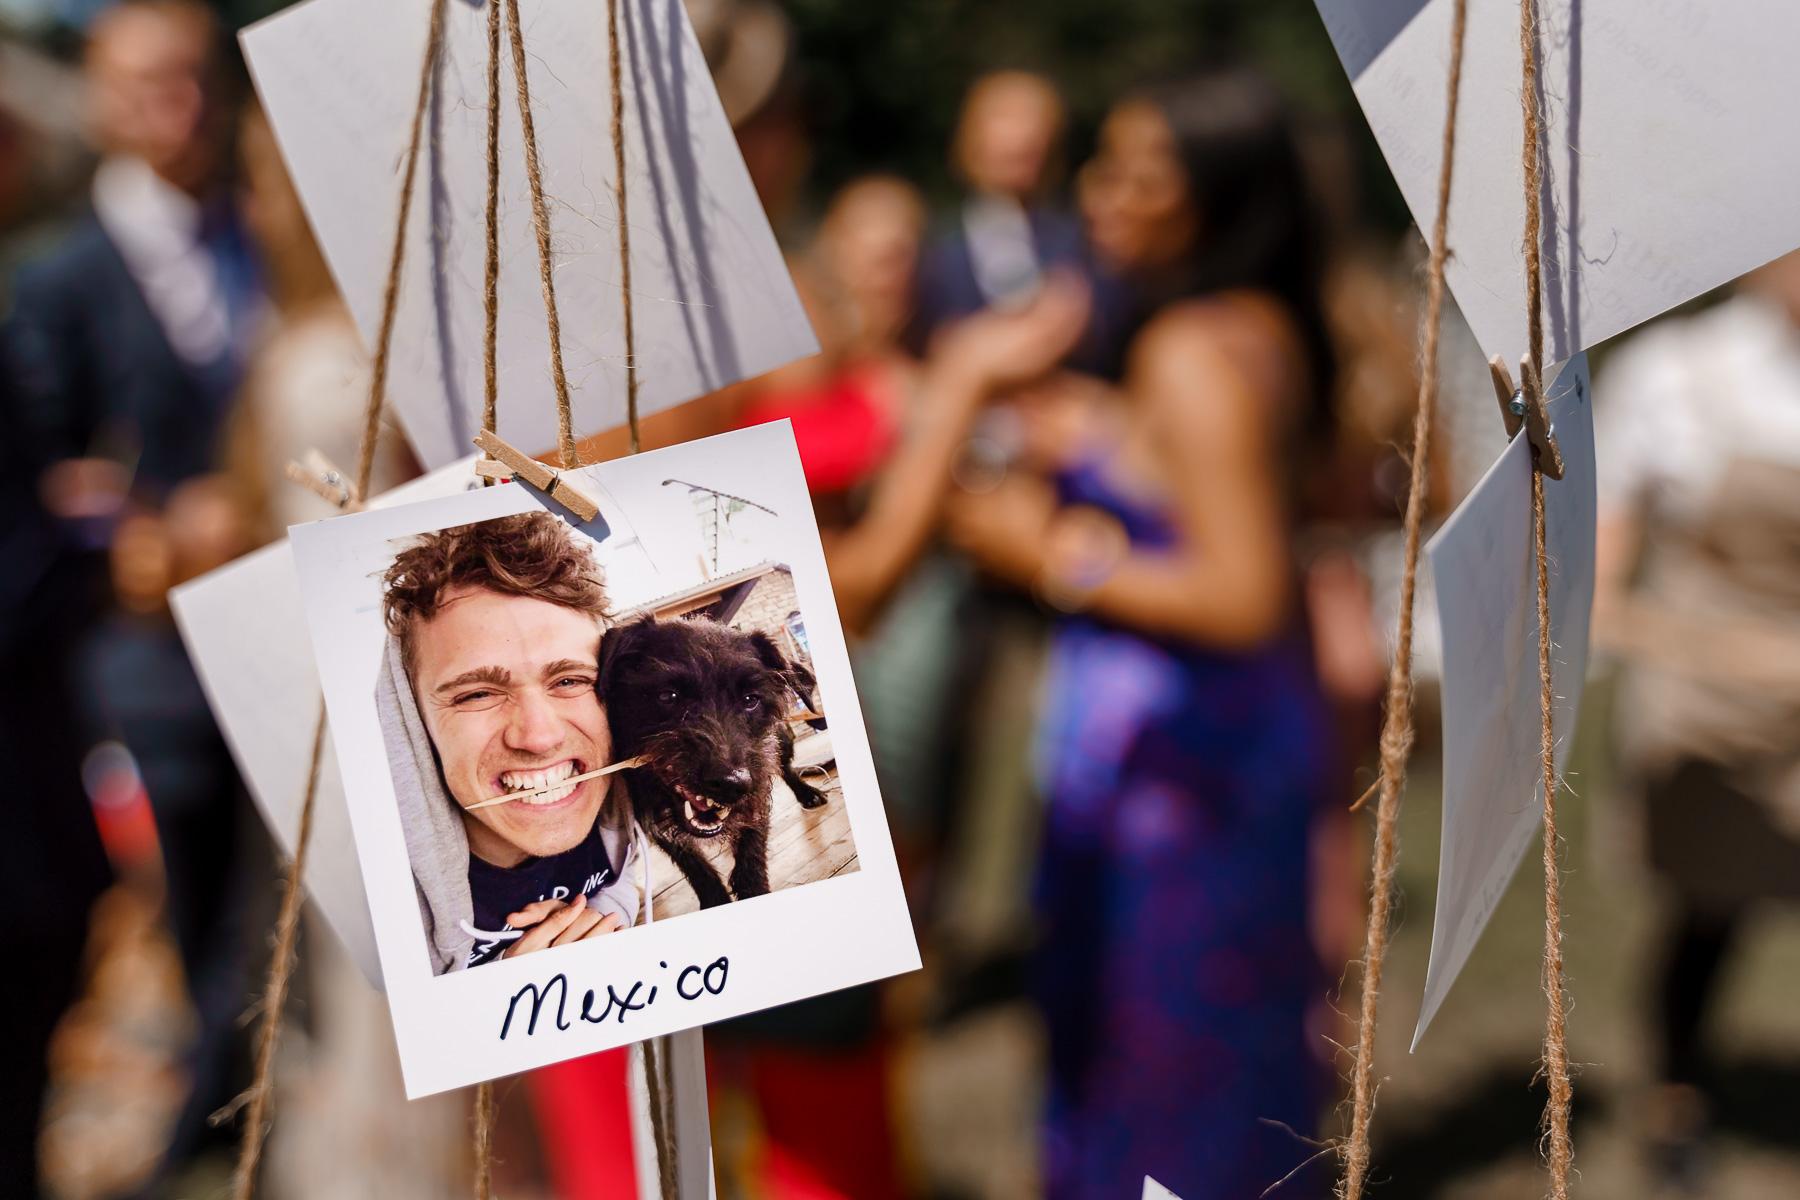 dog friendly wedding- dogs at weddings- katherine and her camera- dog wedding accessories-unconventional wedding- wedding planning advice- pets at weddings- wedding Polaroid